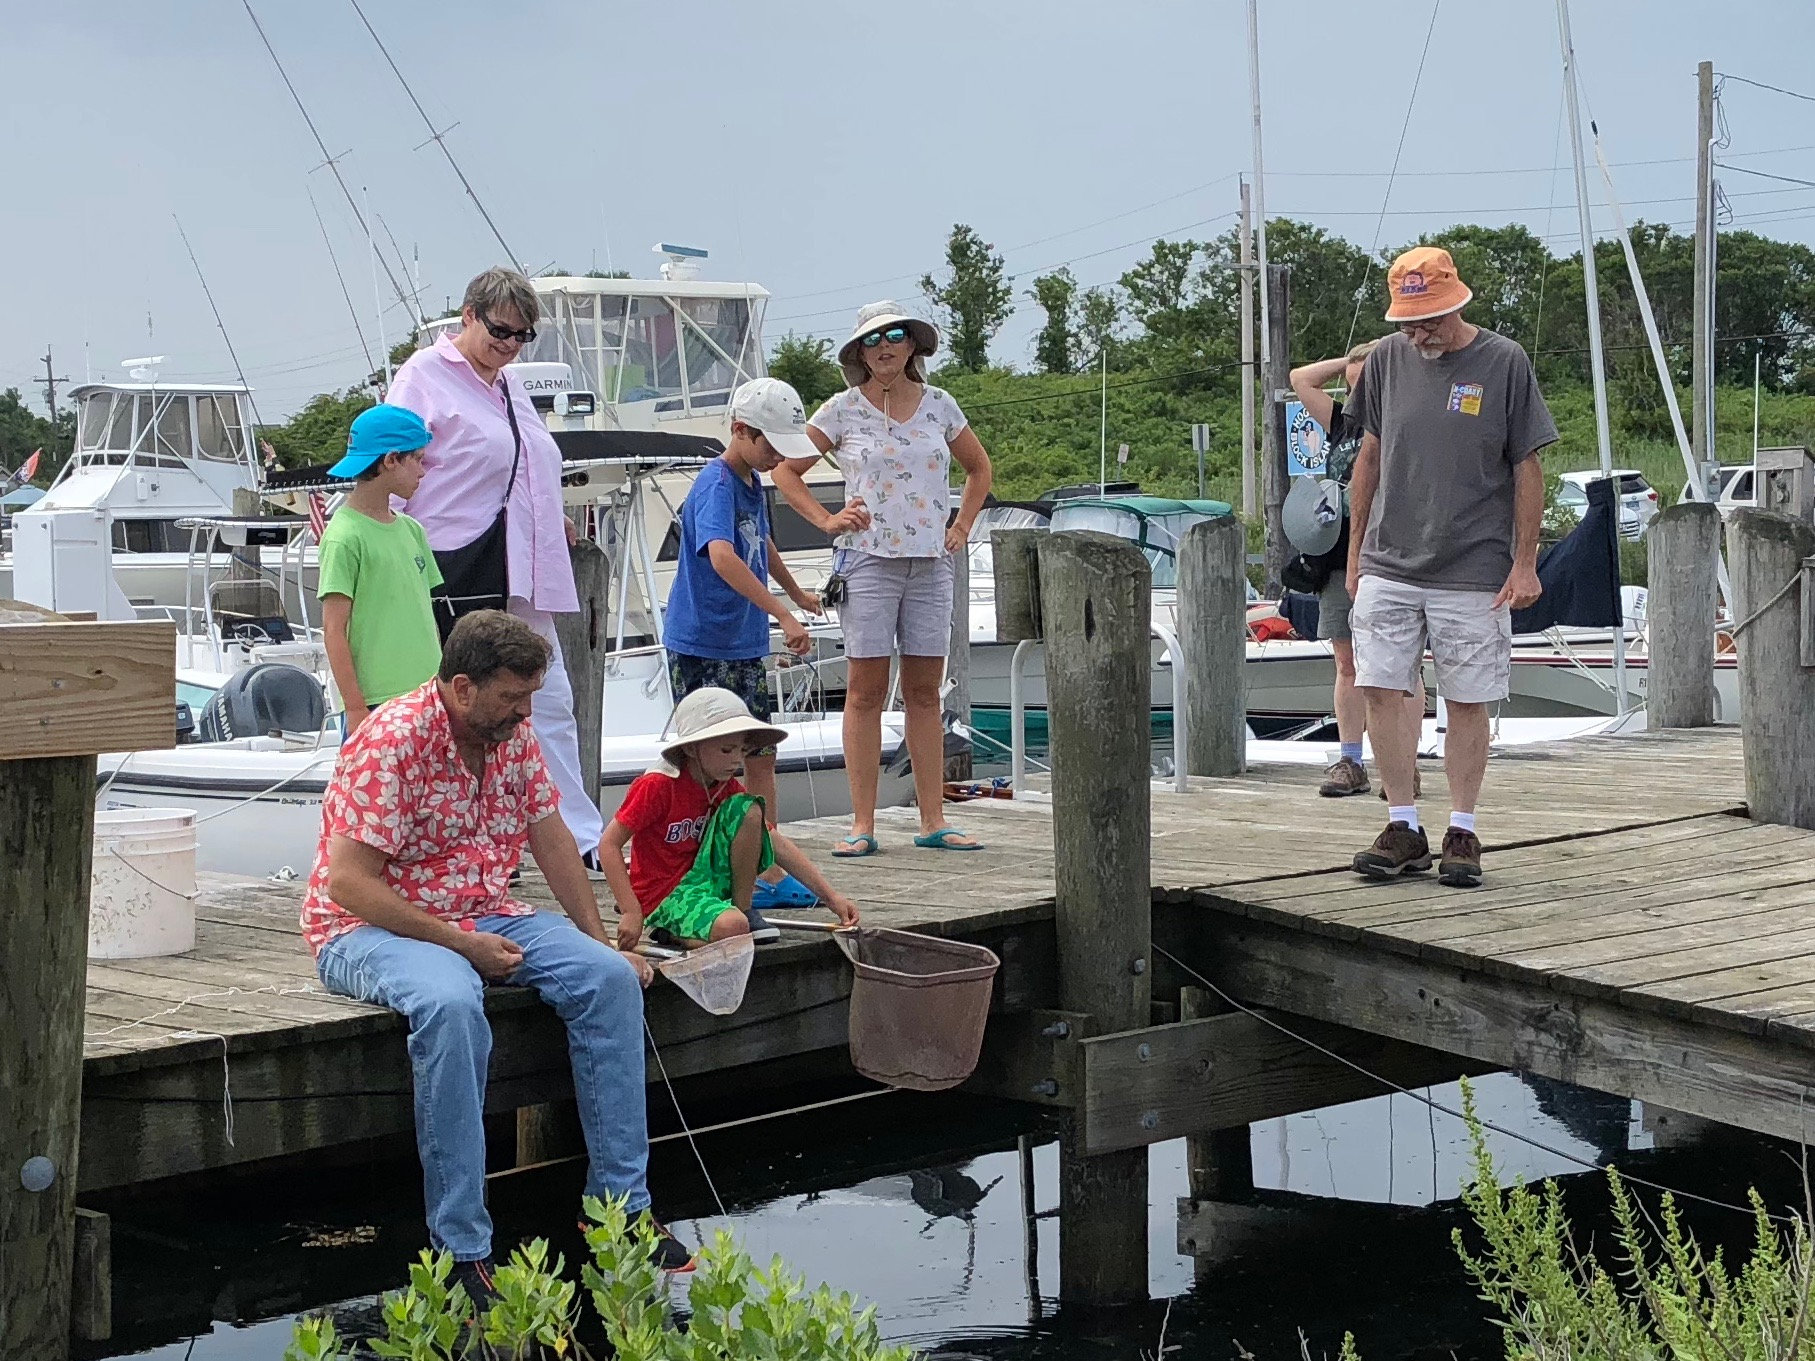 081218-crabbing-in-New-Shoreham